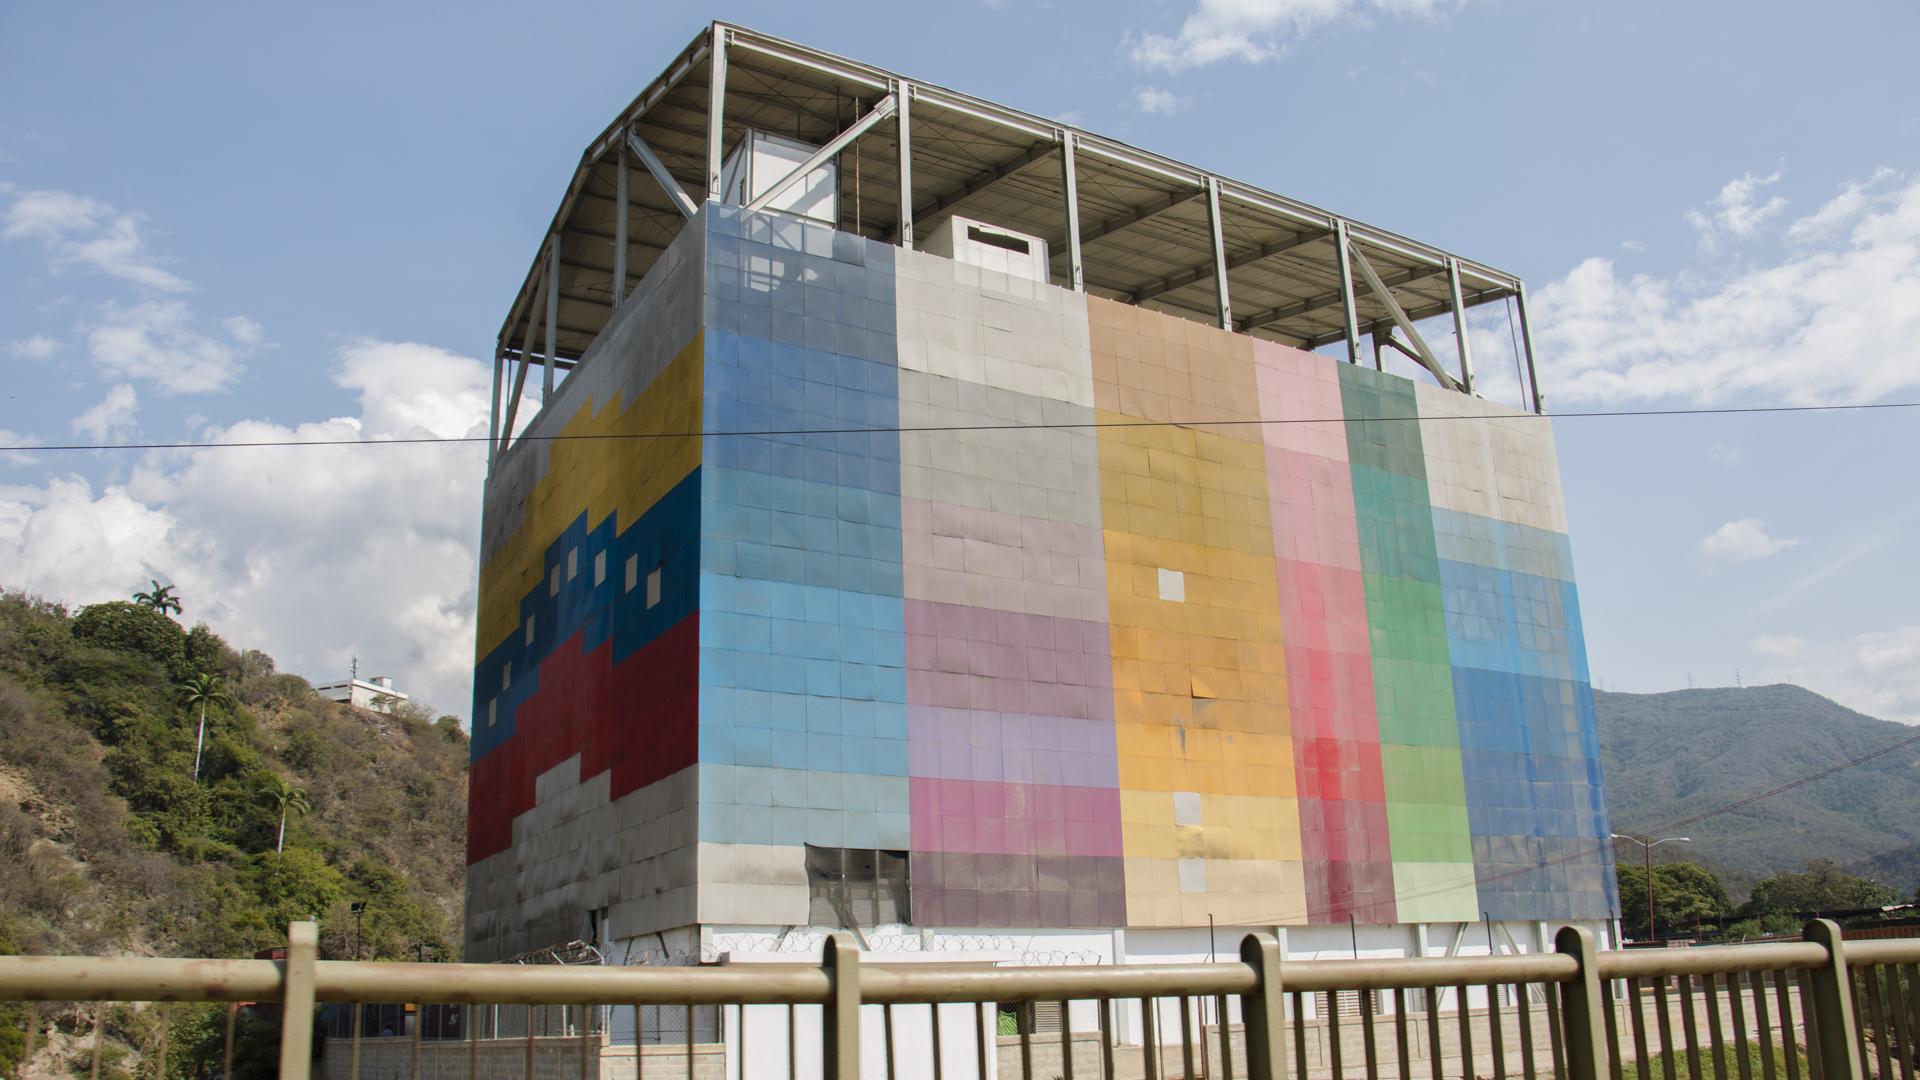 Maduro confirma que adecuarán gimnasios verticales para atender a pacientes con covid-19